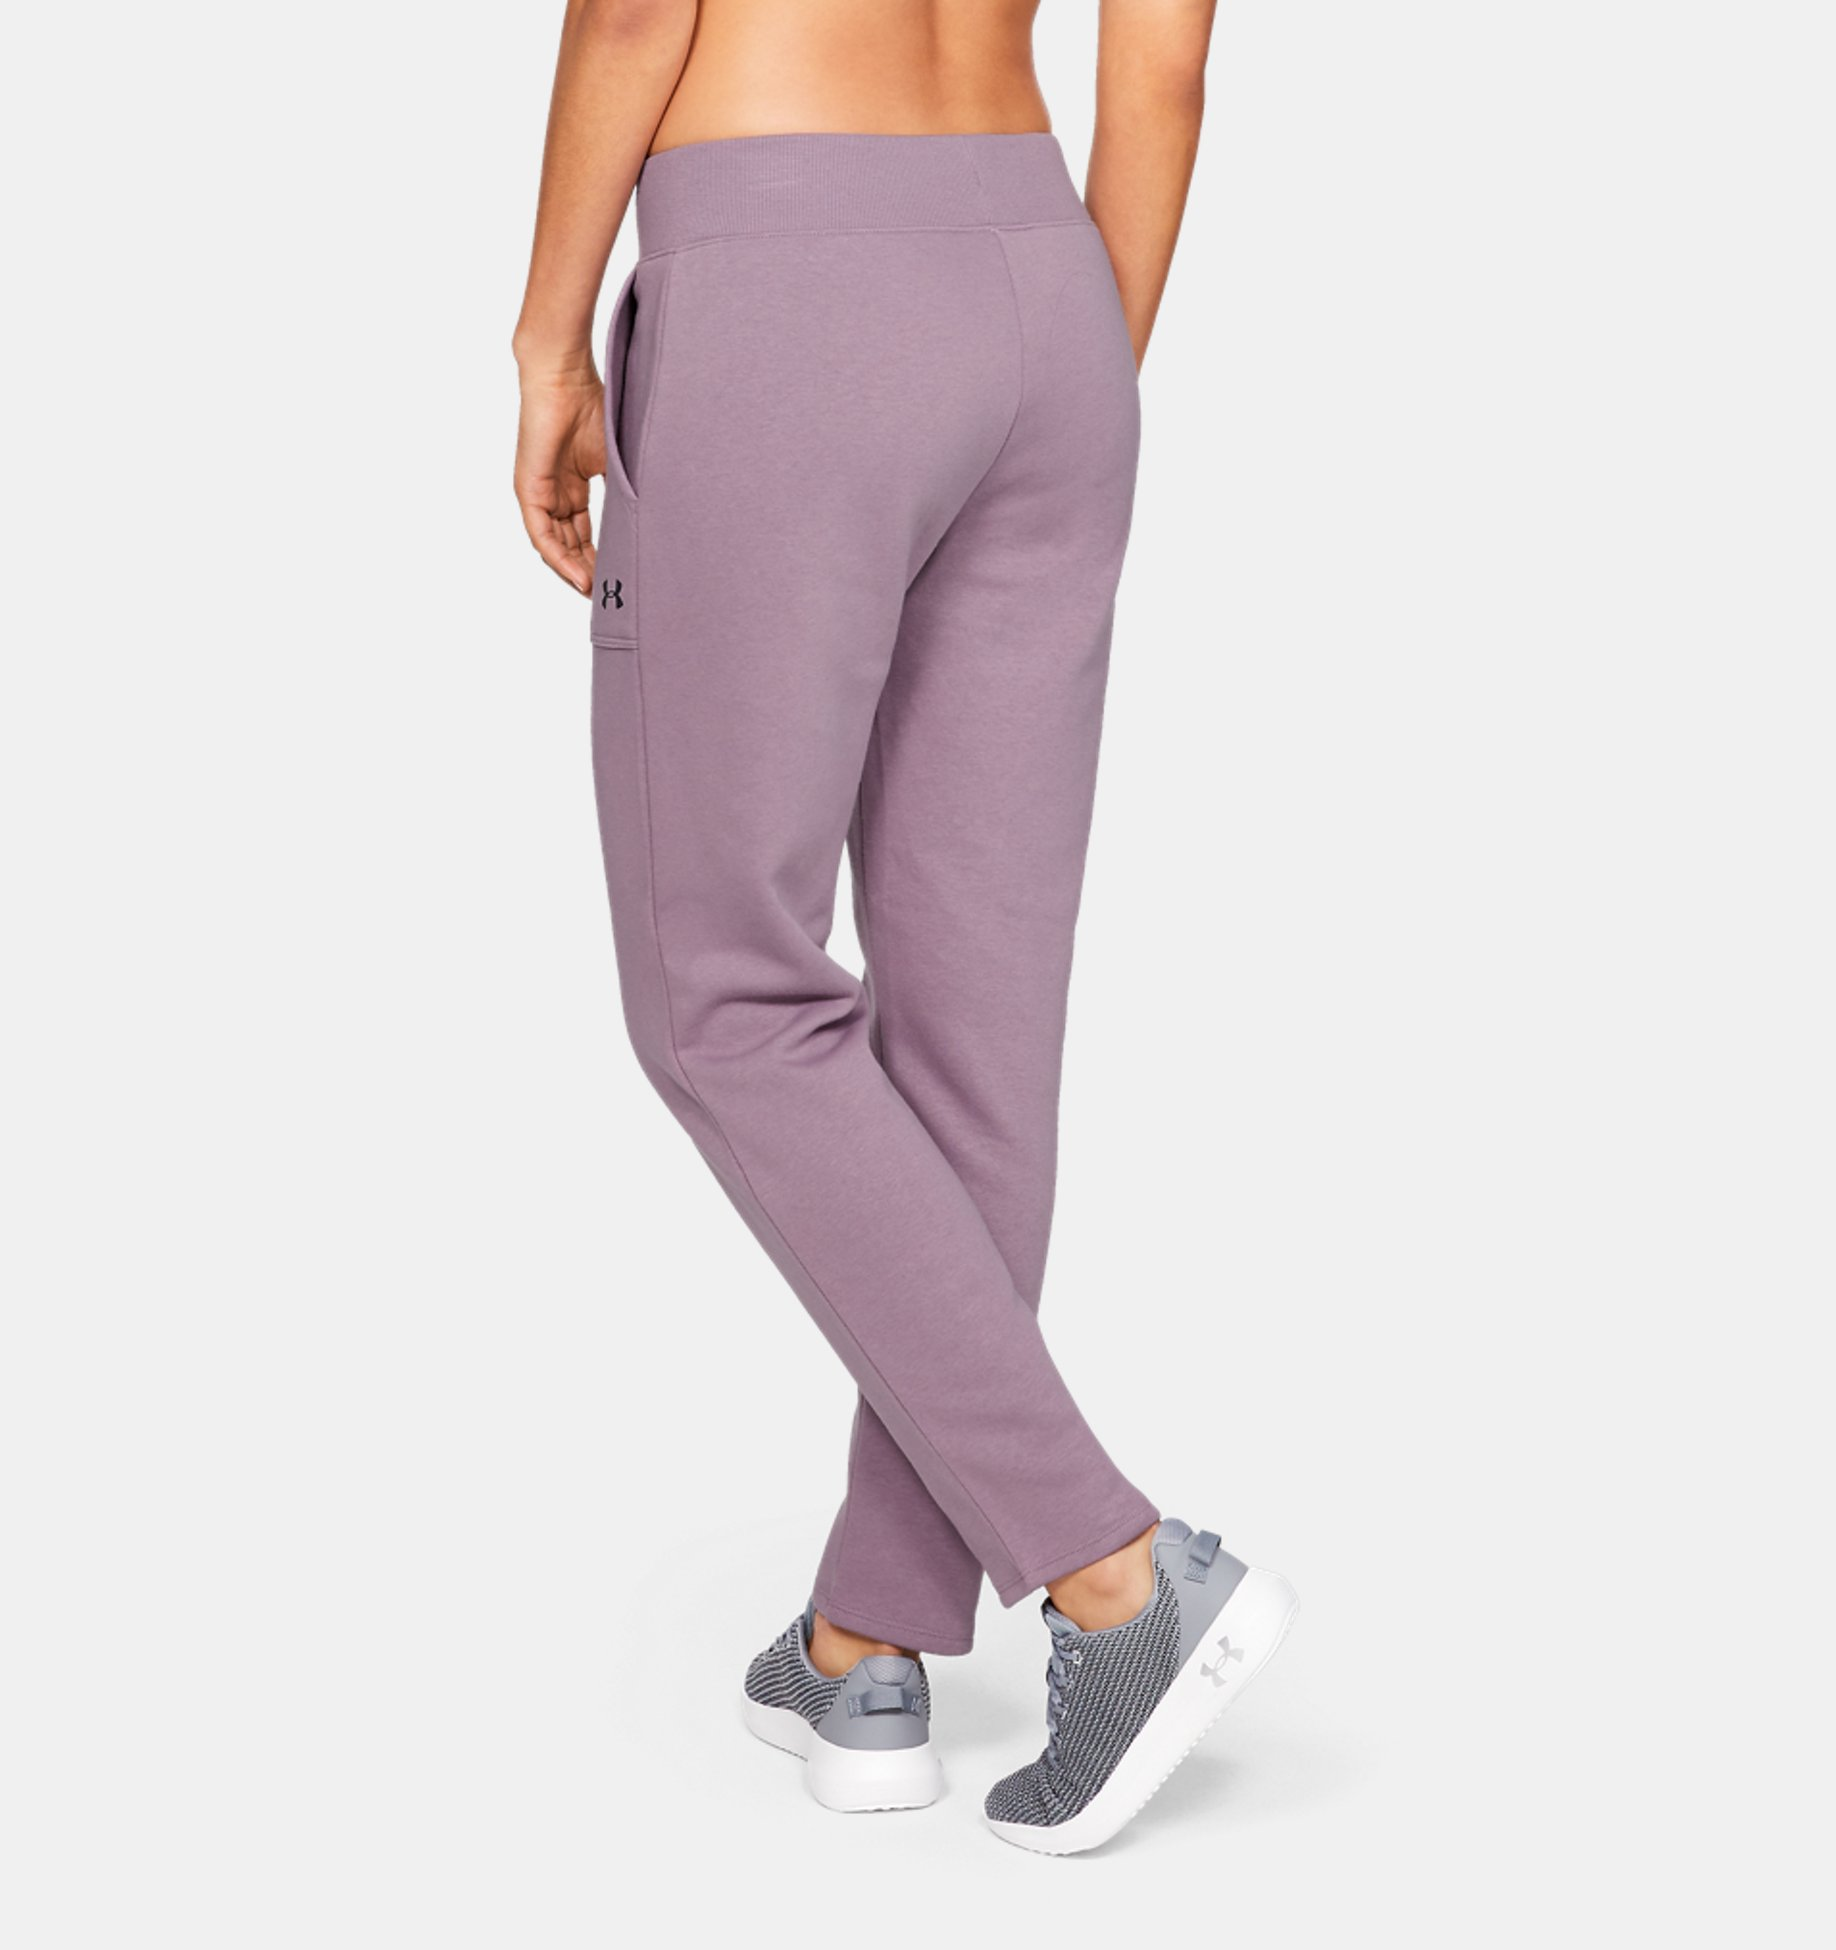 ... Pantalón de tejido Fleece UA Rival para mujer ... 8dff9f1f5cbf